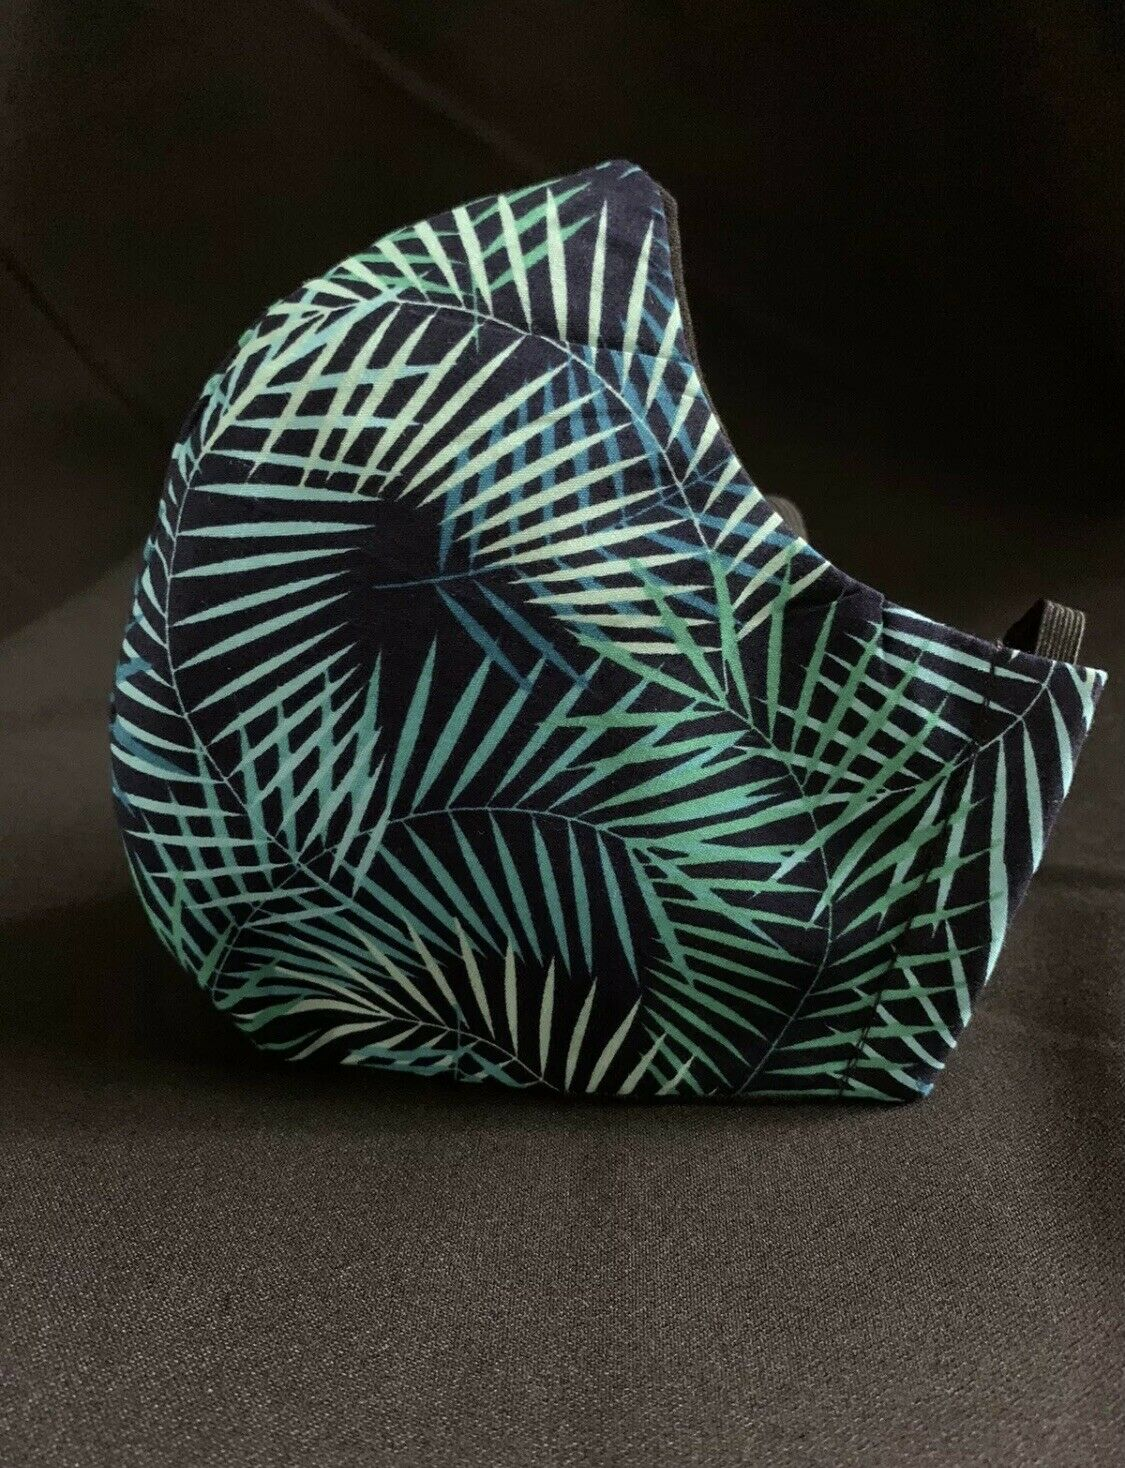 Face Mask -Handmade Funky-Fashionable-Navy Blue Jungle Trails - Cotton- Unisex